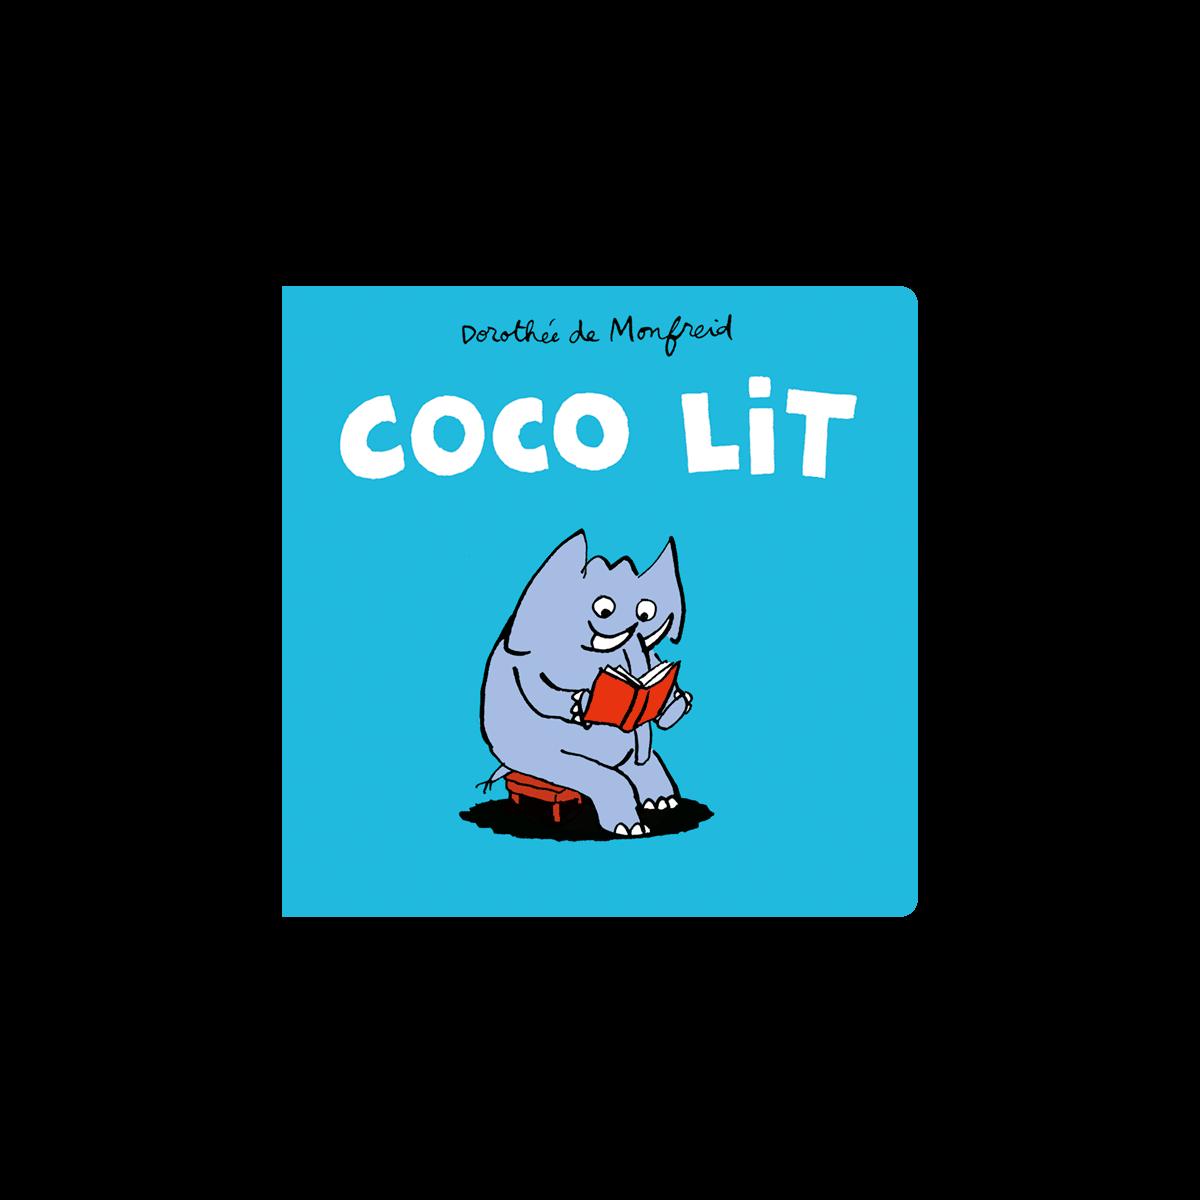 coco-lit-couv2